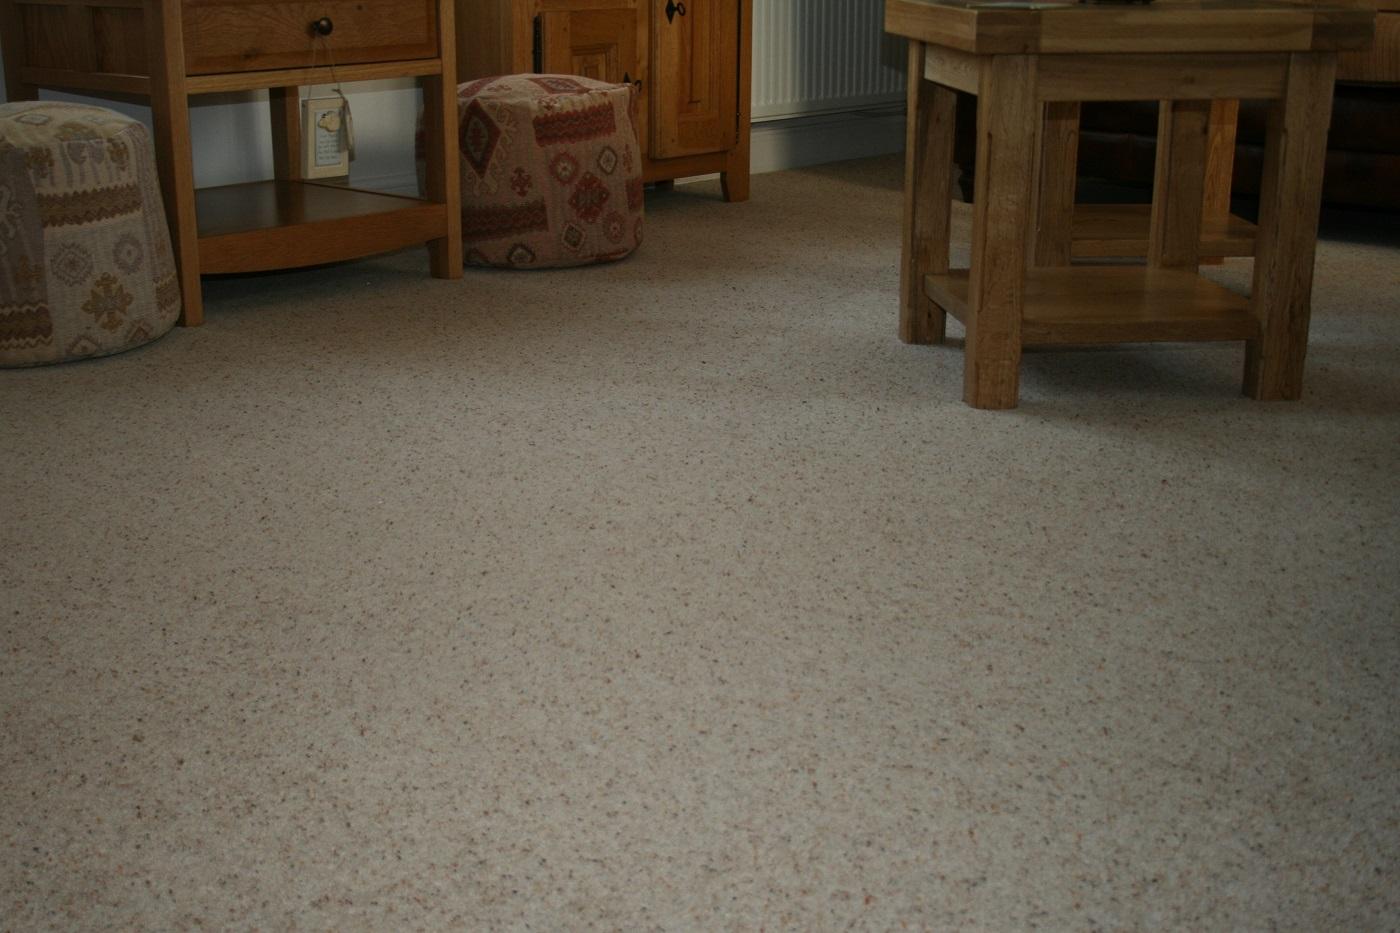 Lounge Strathmore Heathers Carpet Flooring Studio